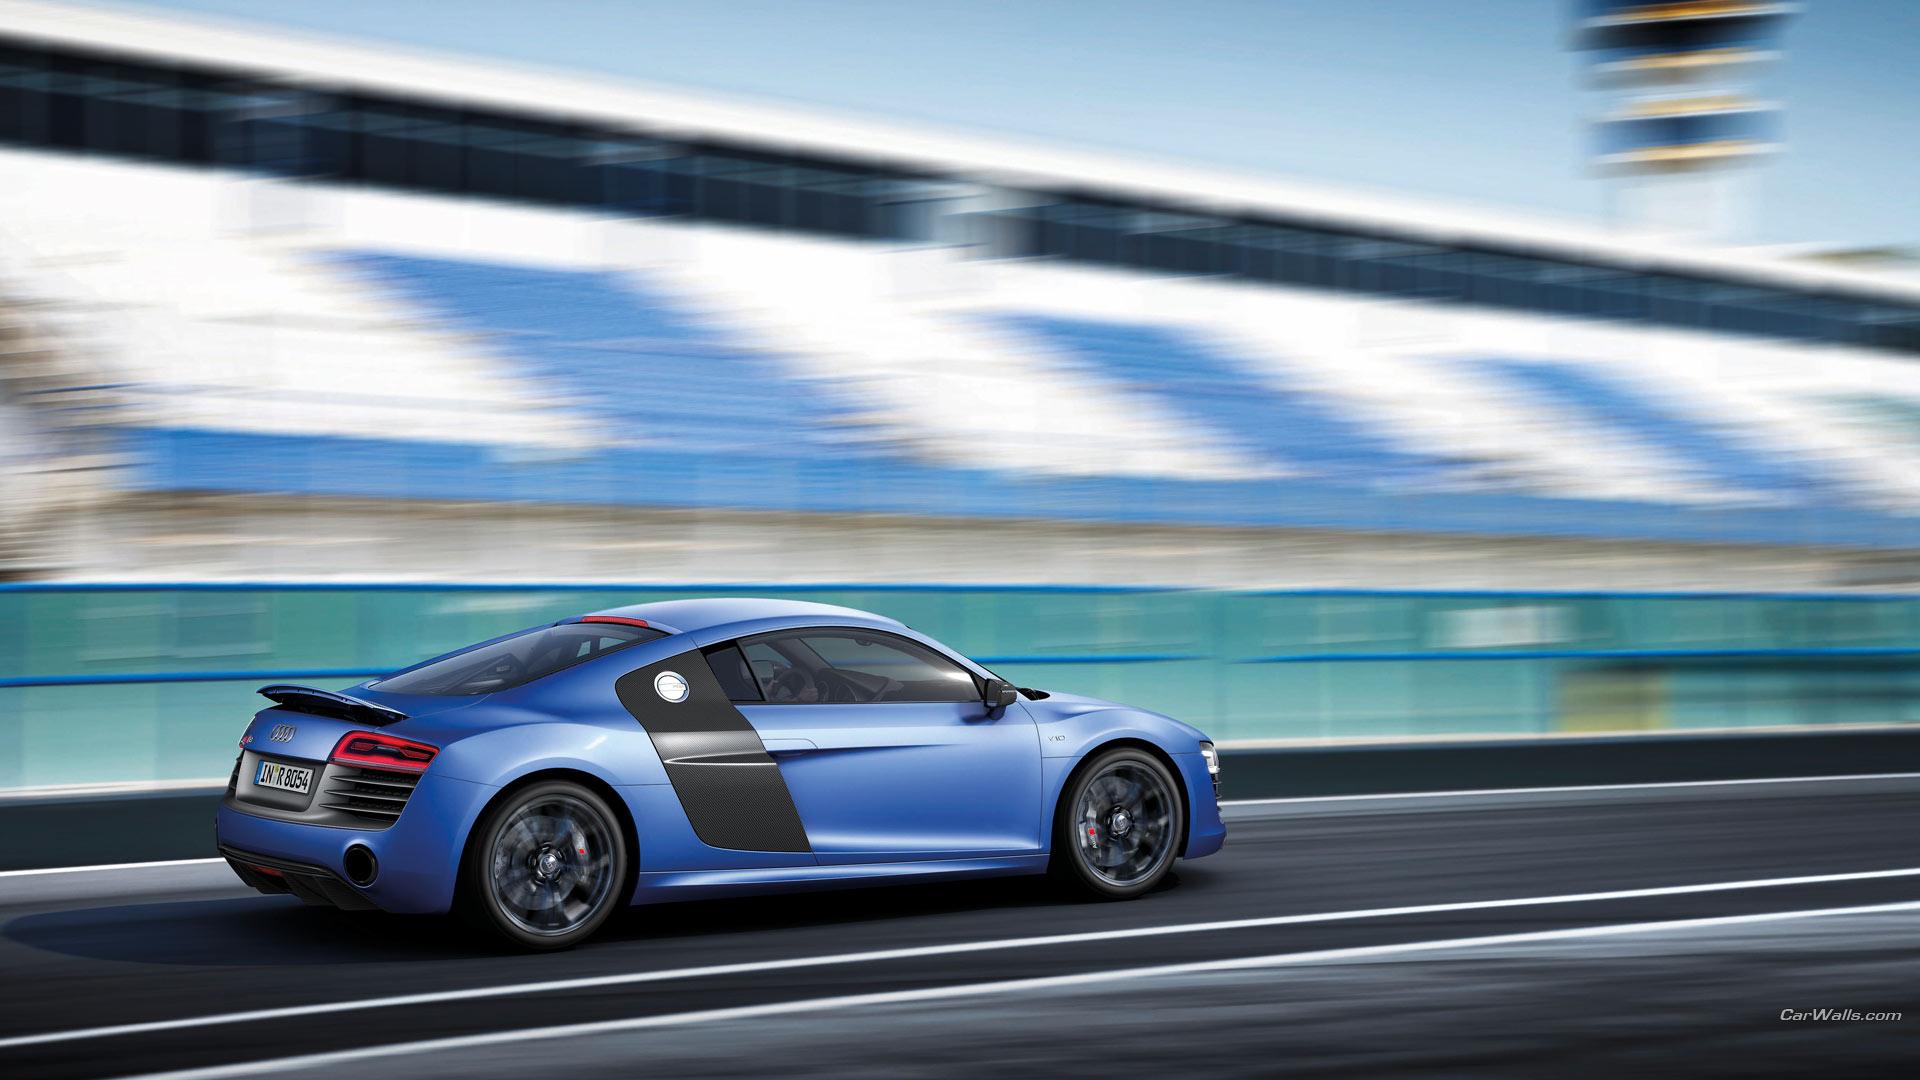 Audi Wallpaper background picture